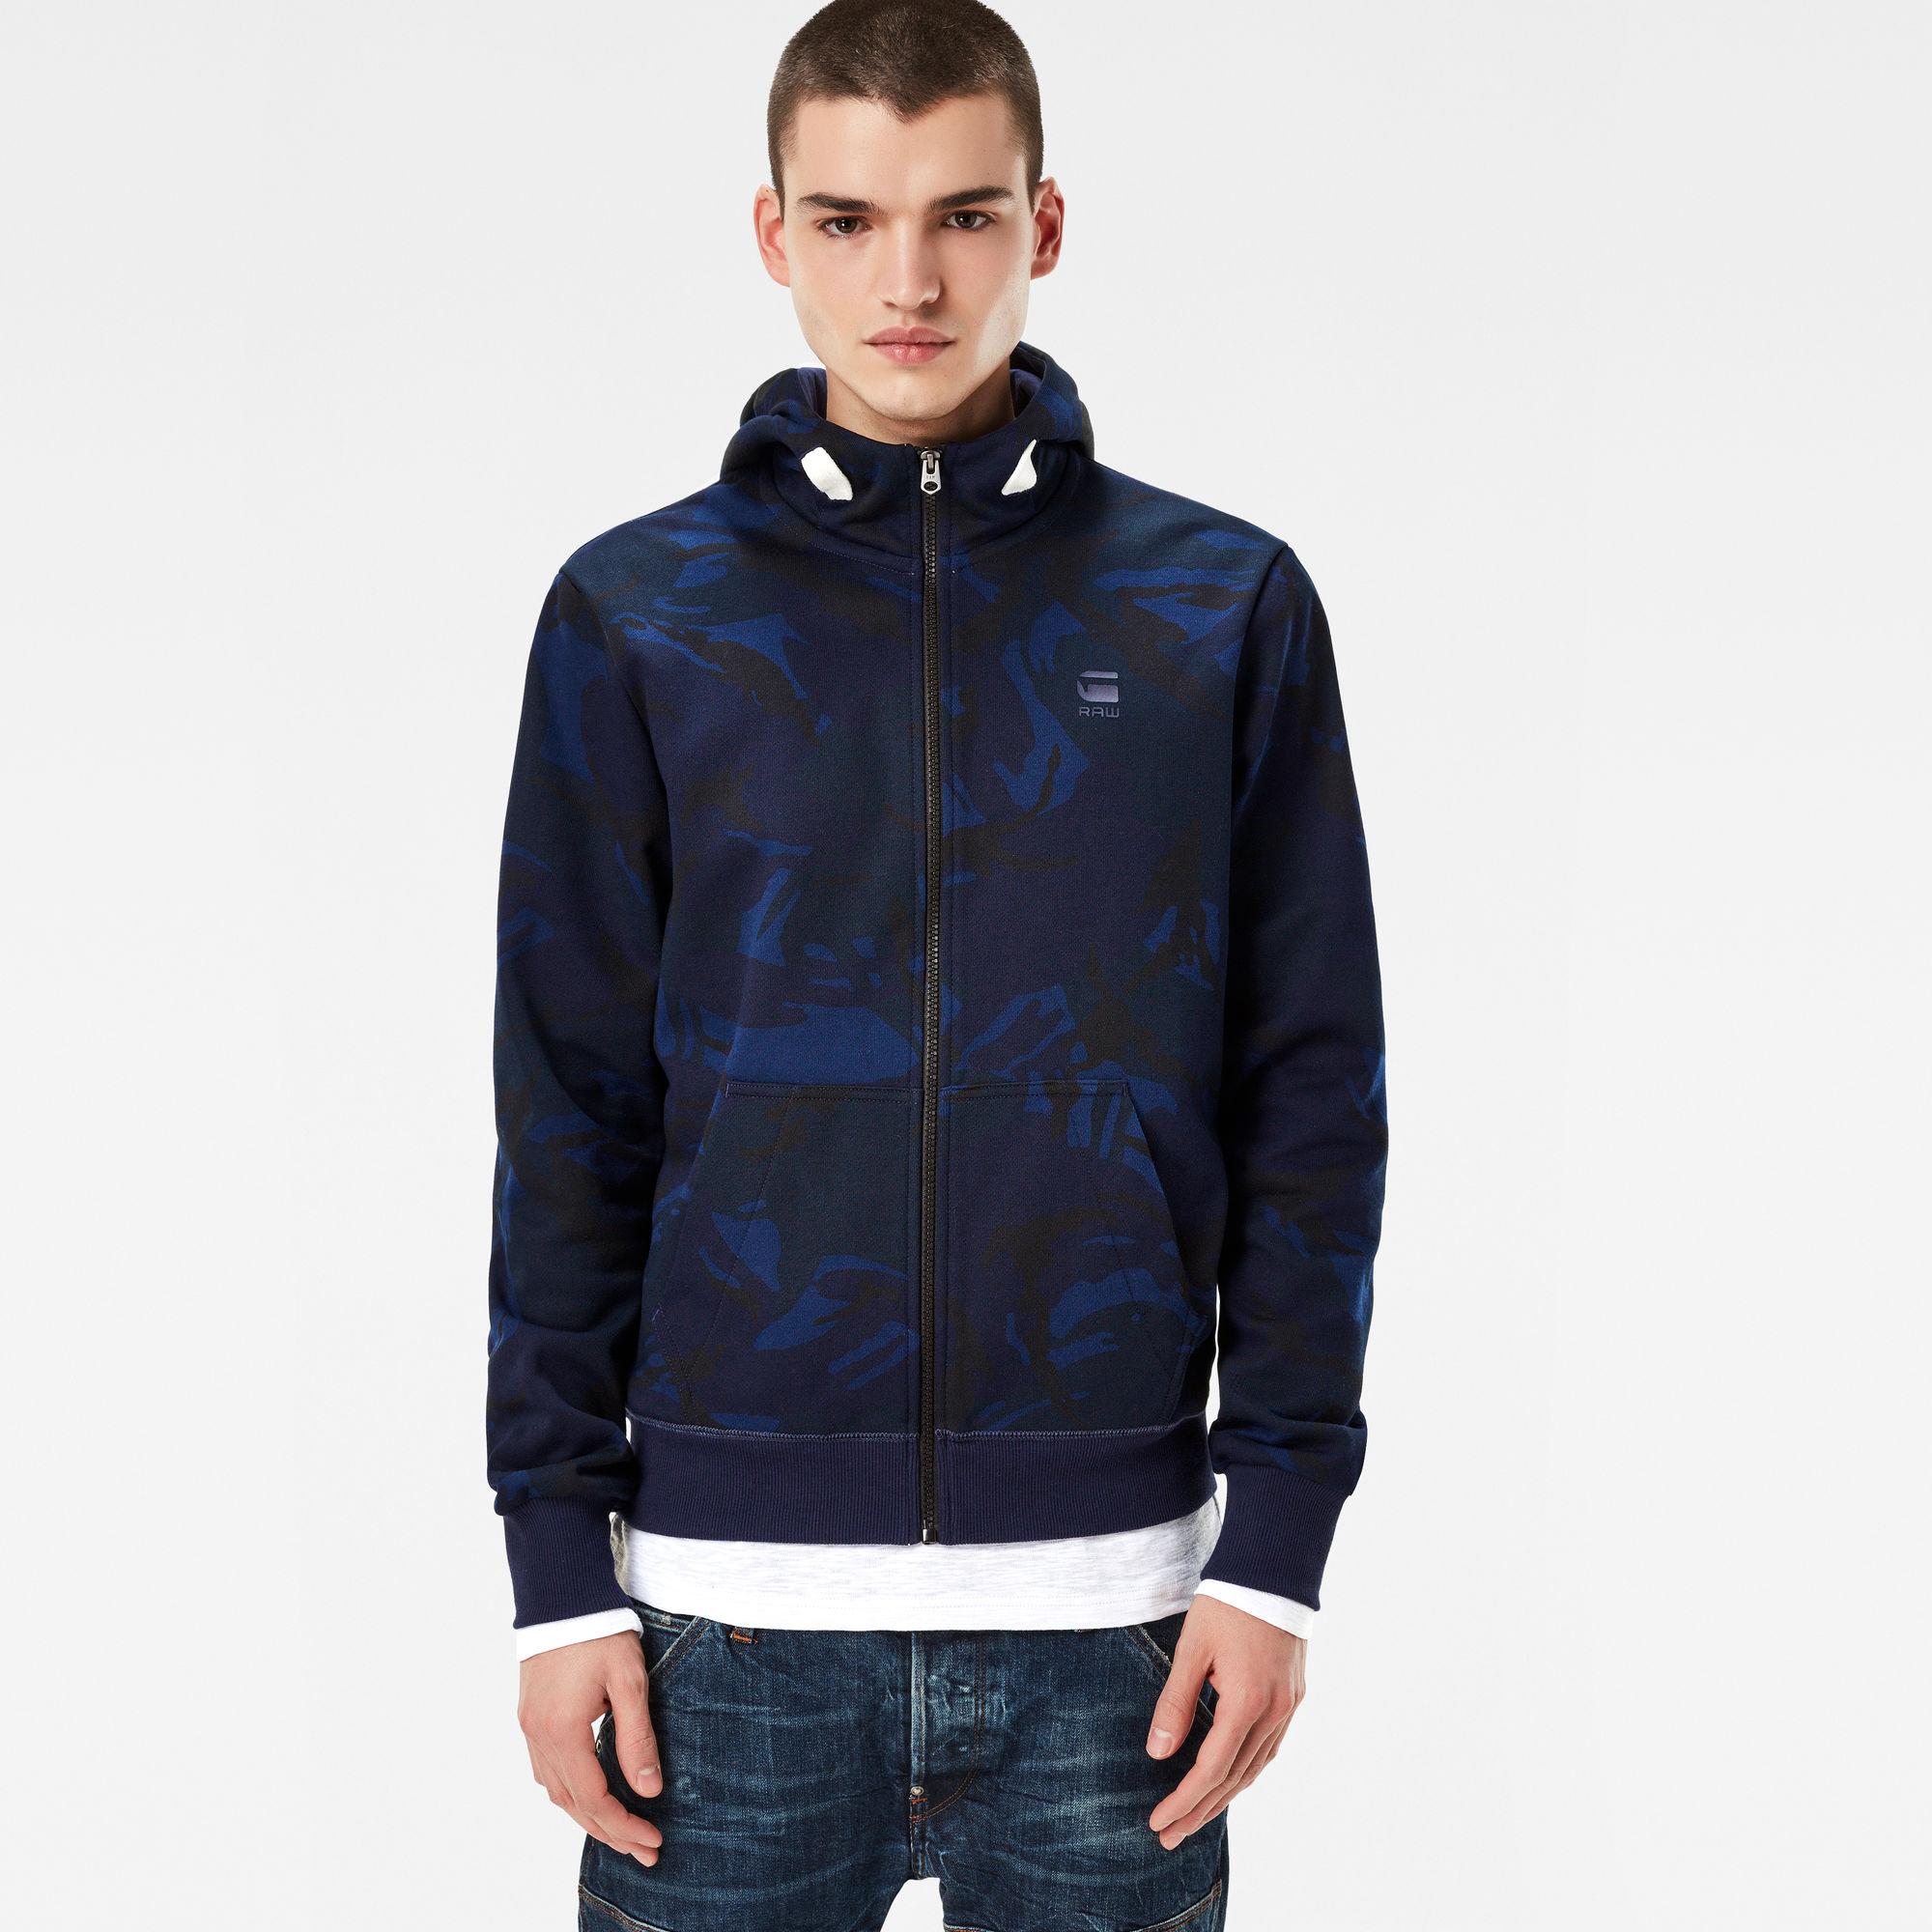 Hoyn Hooded Sweater